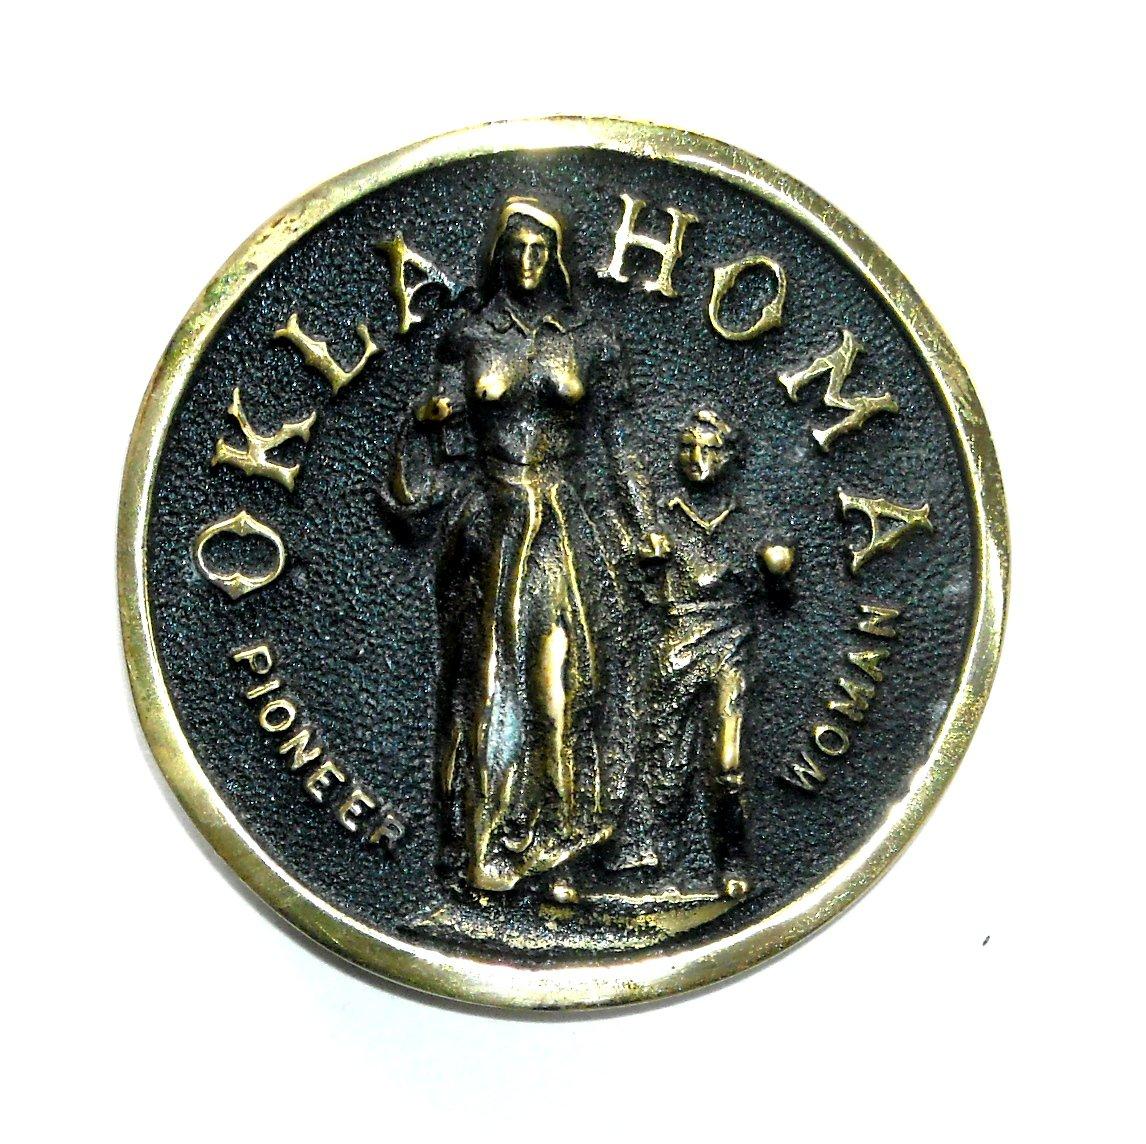 Oklahoma Pioneer Woman Heritage Mint Solid Brass Vintage Belt Buckle